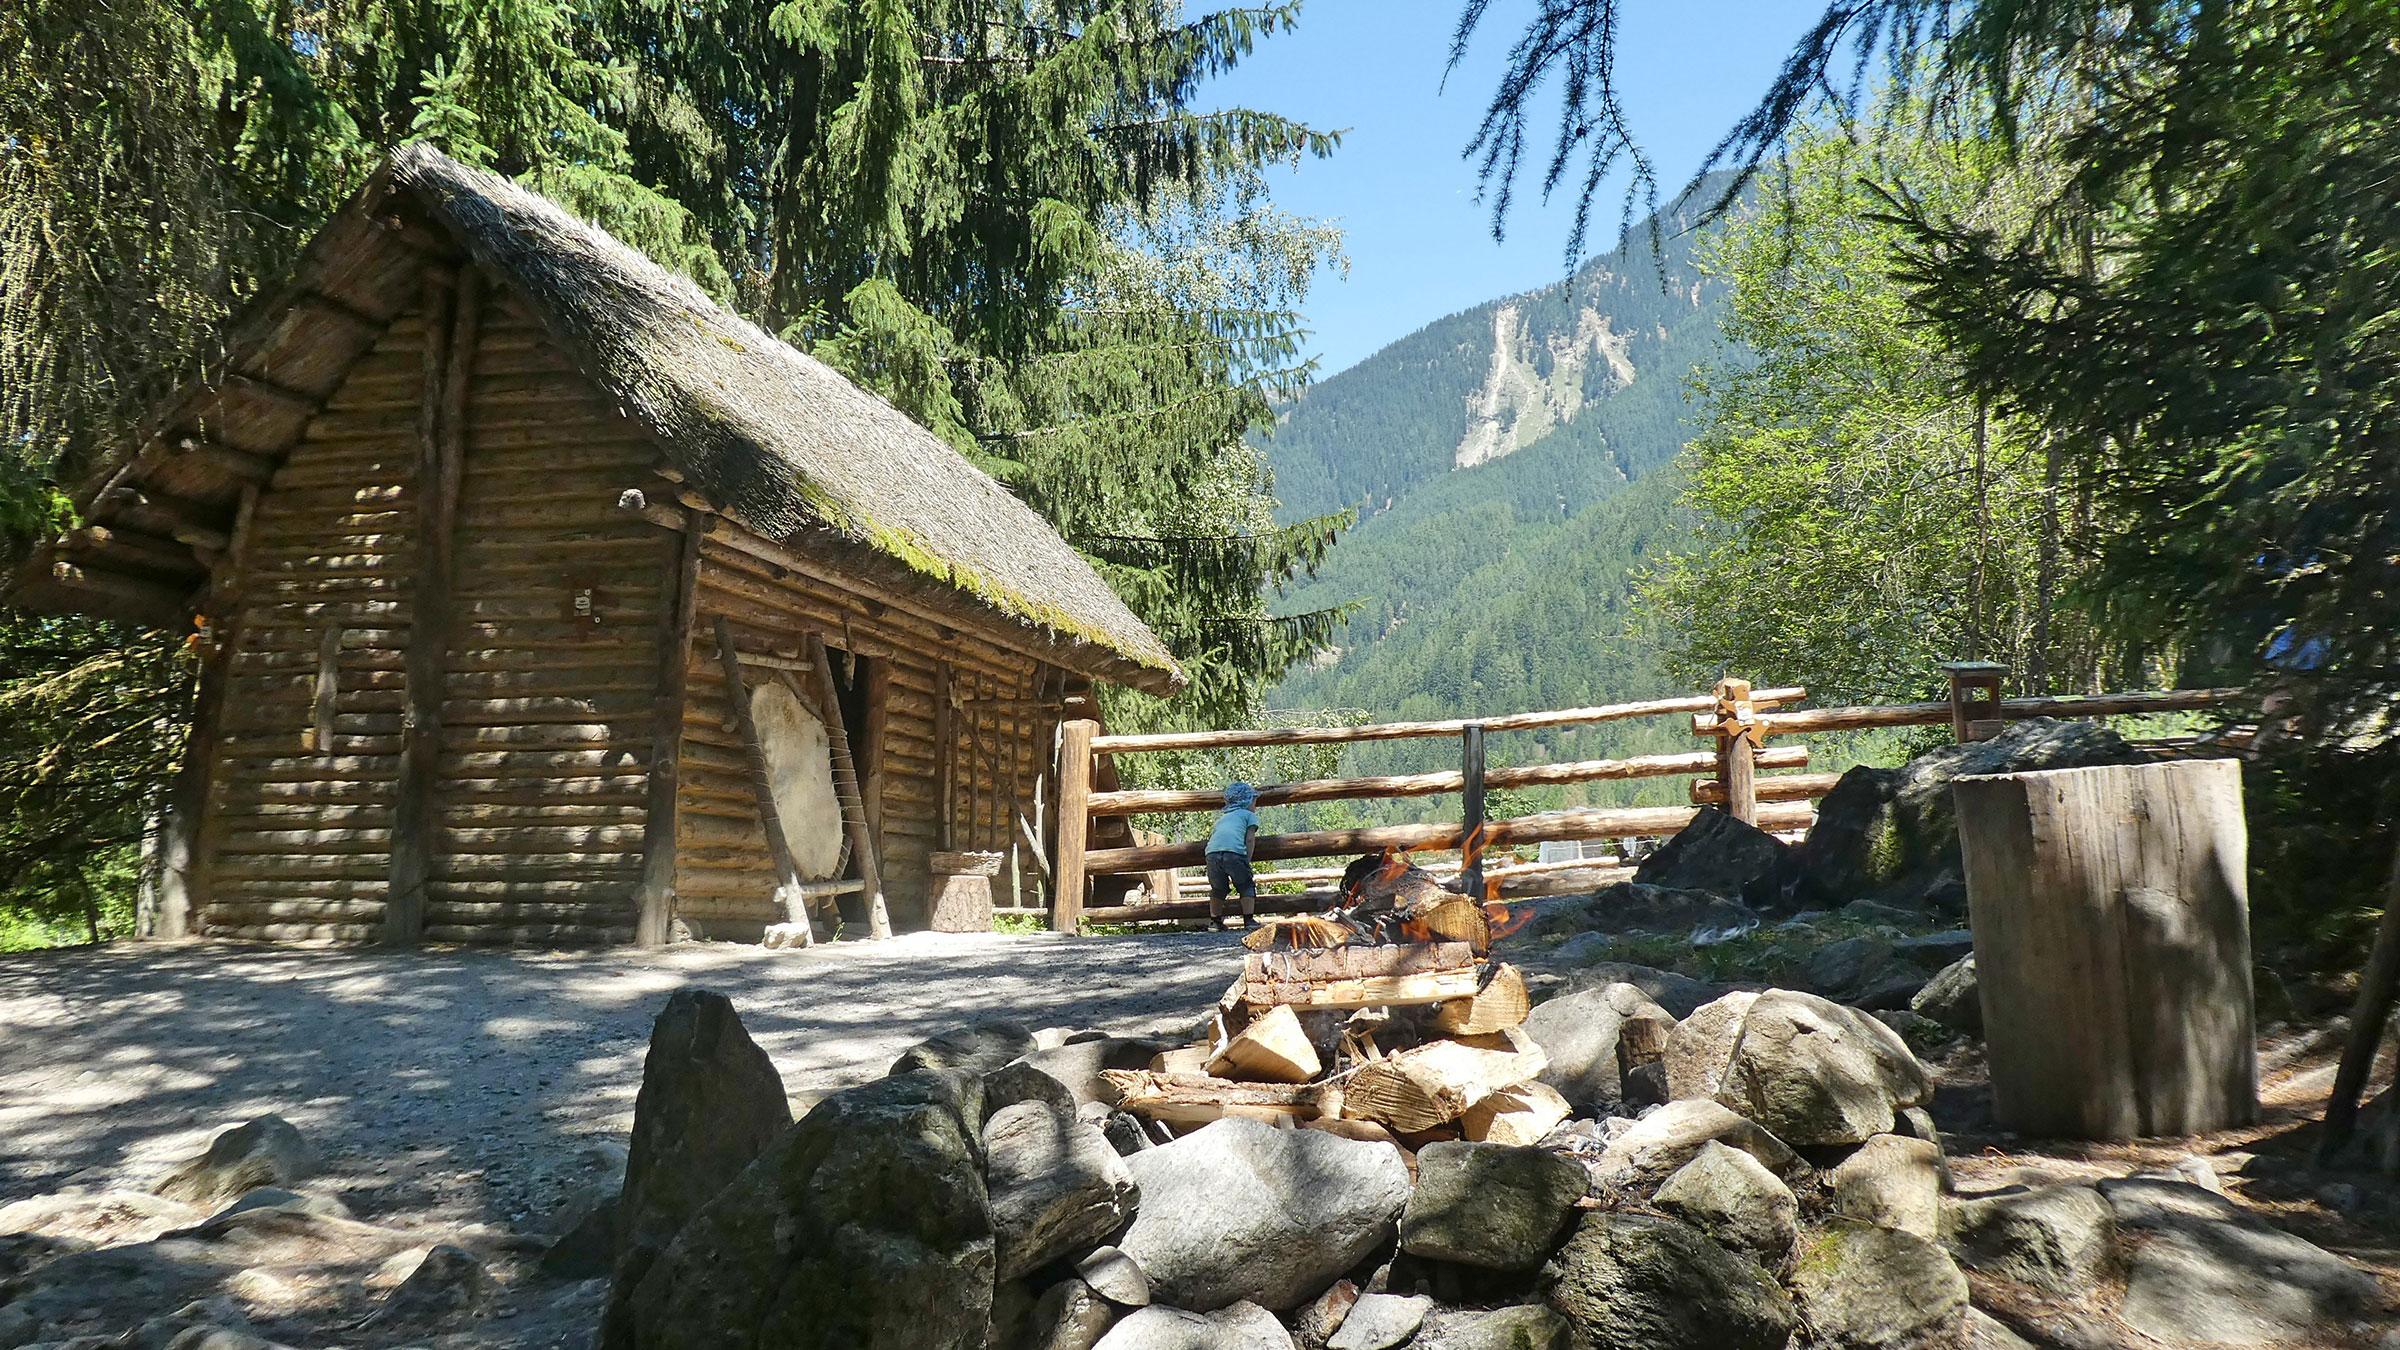 Ötzi-Dorf - Familienurlaub Ötztal Tirol